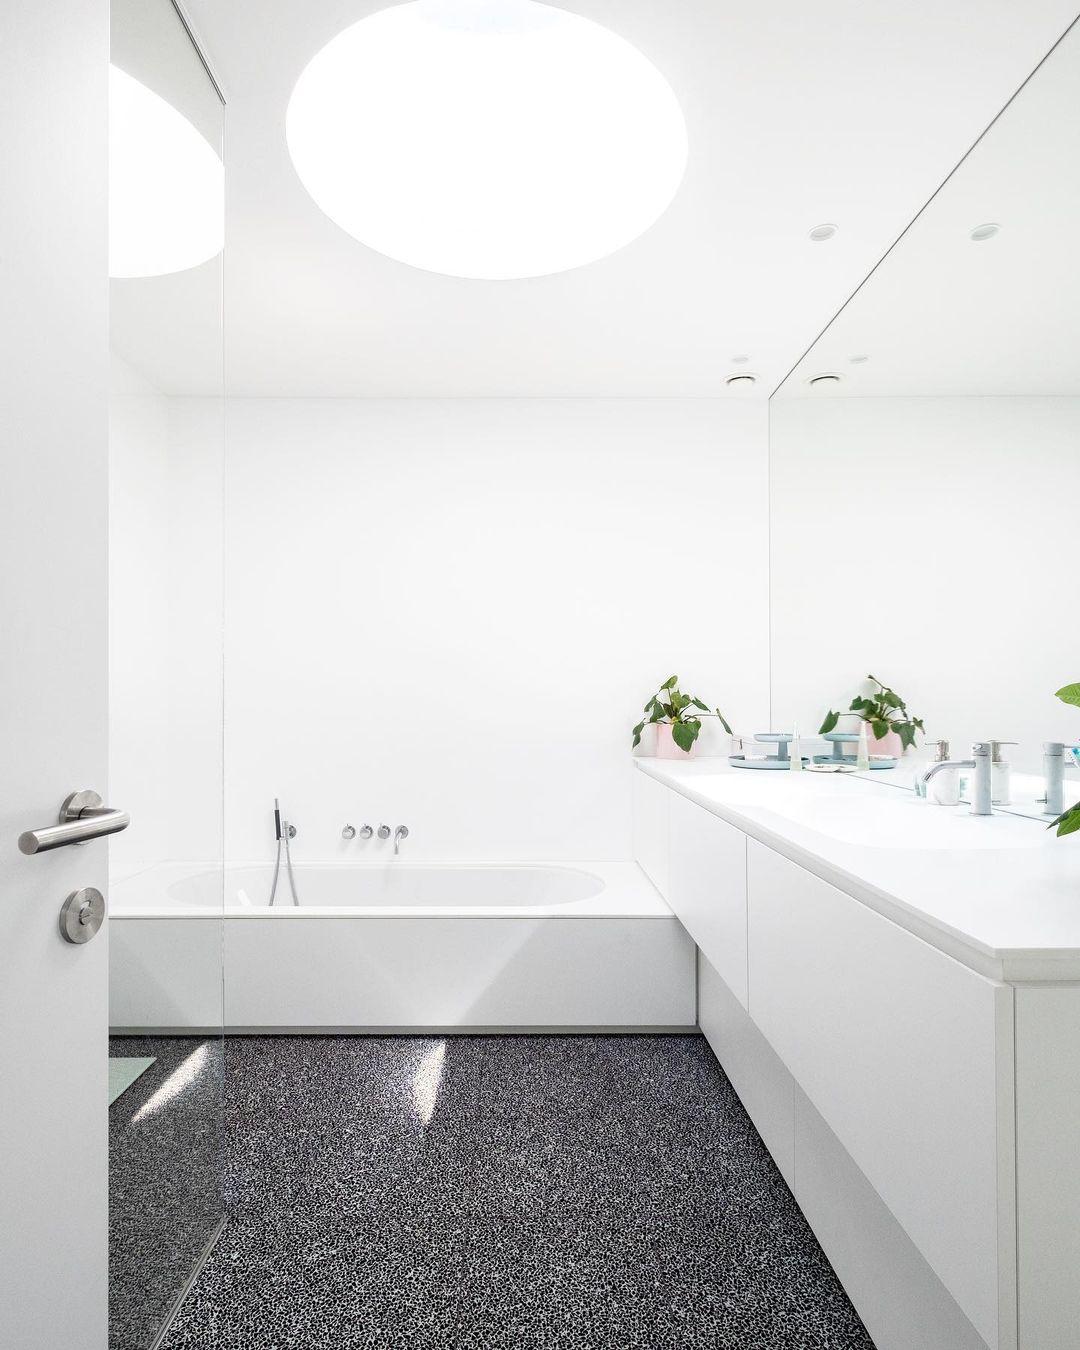 2019 08 24 B1jQ0fqodEH 2117610225952477447 | Baeyens & Beck architecten Gent | architect nieuwbouw renovatie interieur | high end | architectenbureau